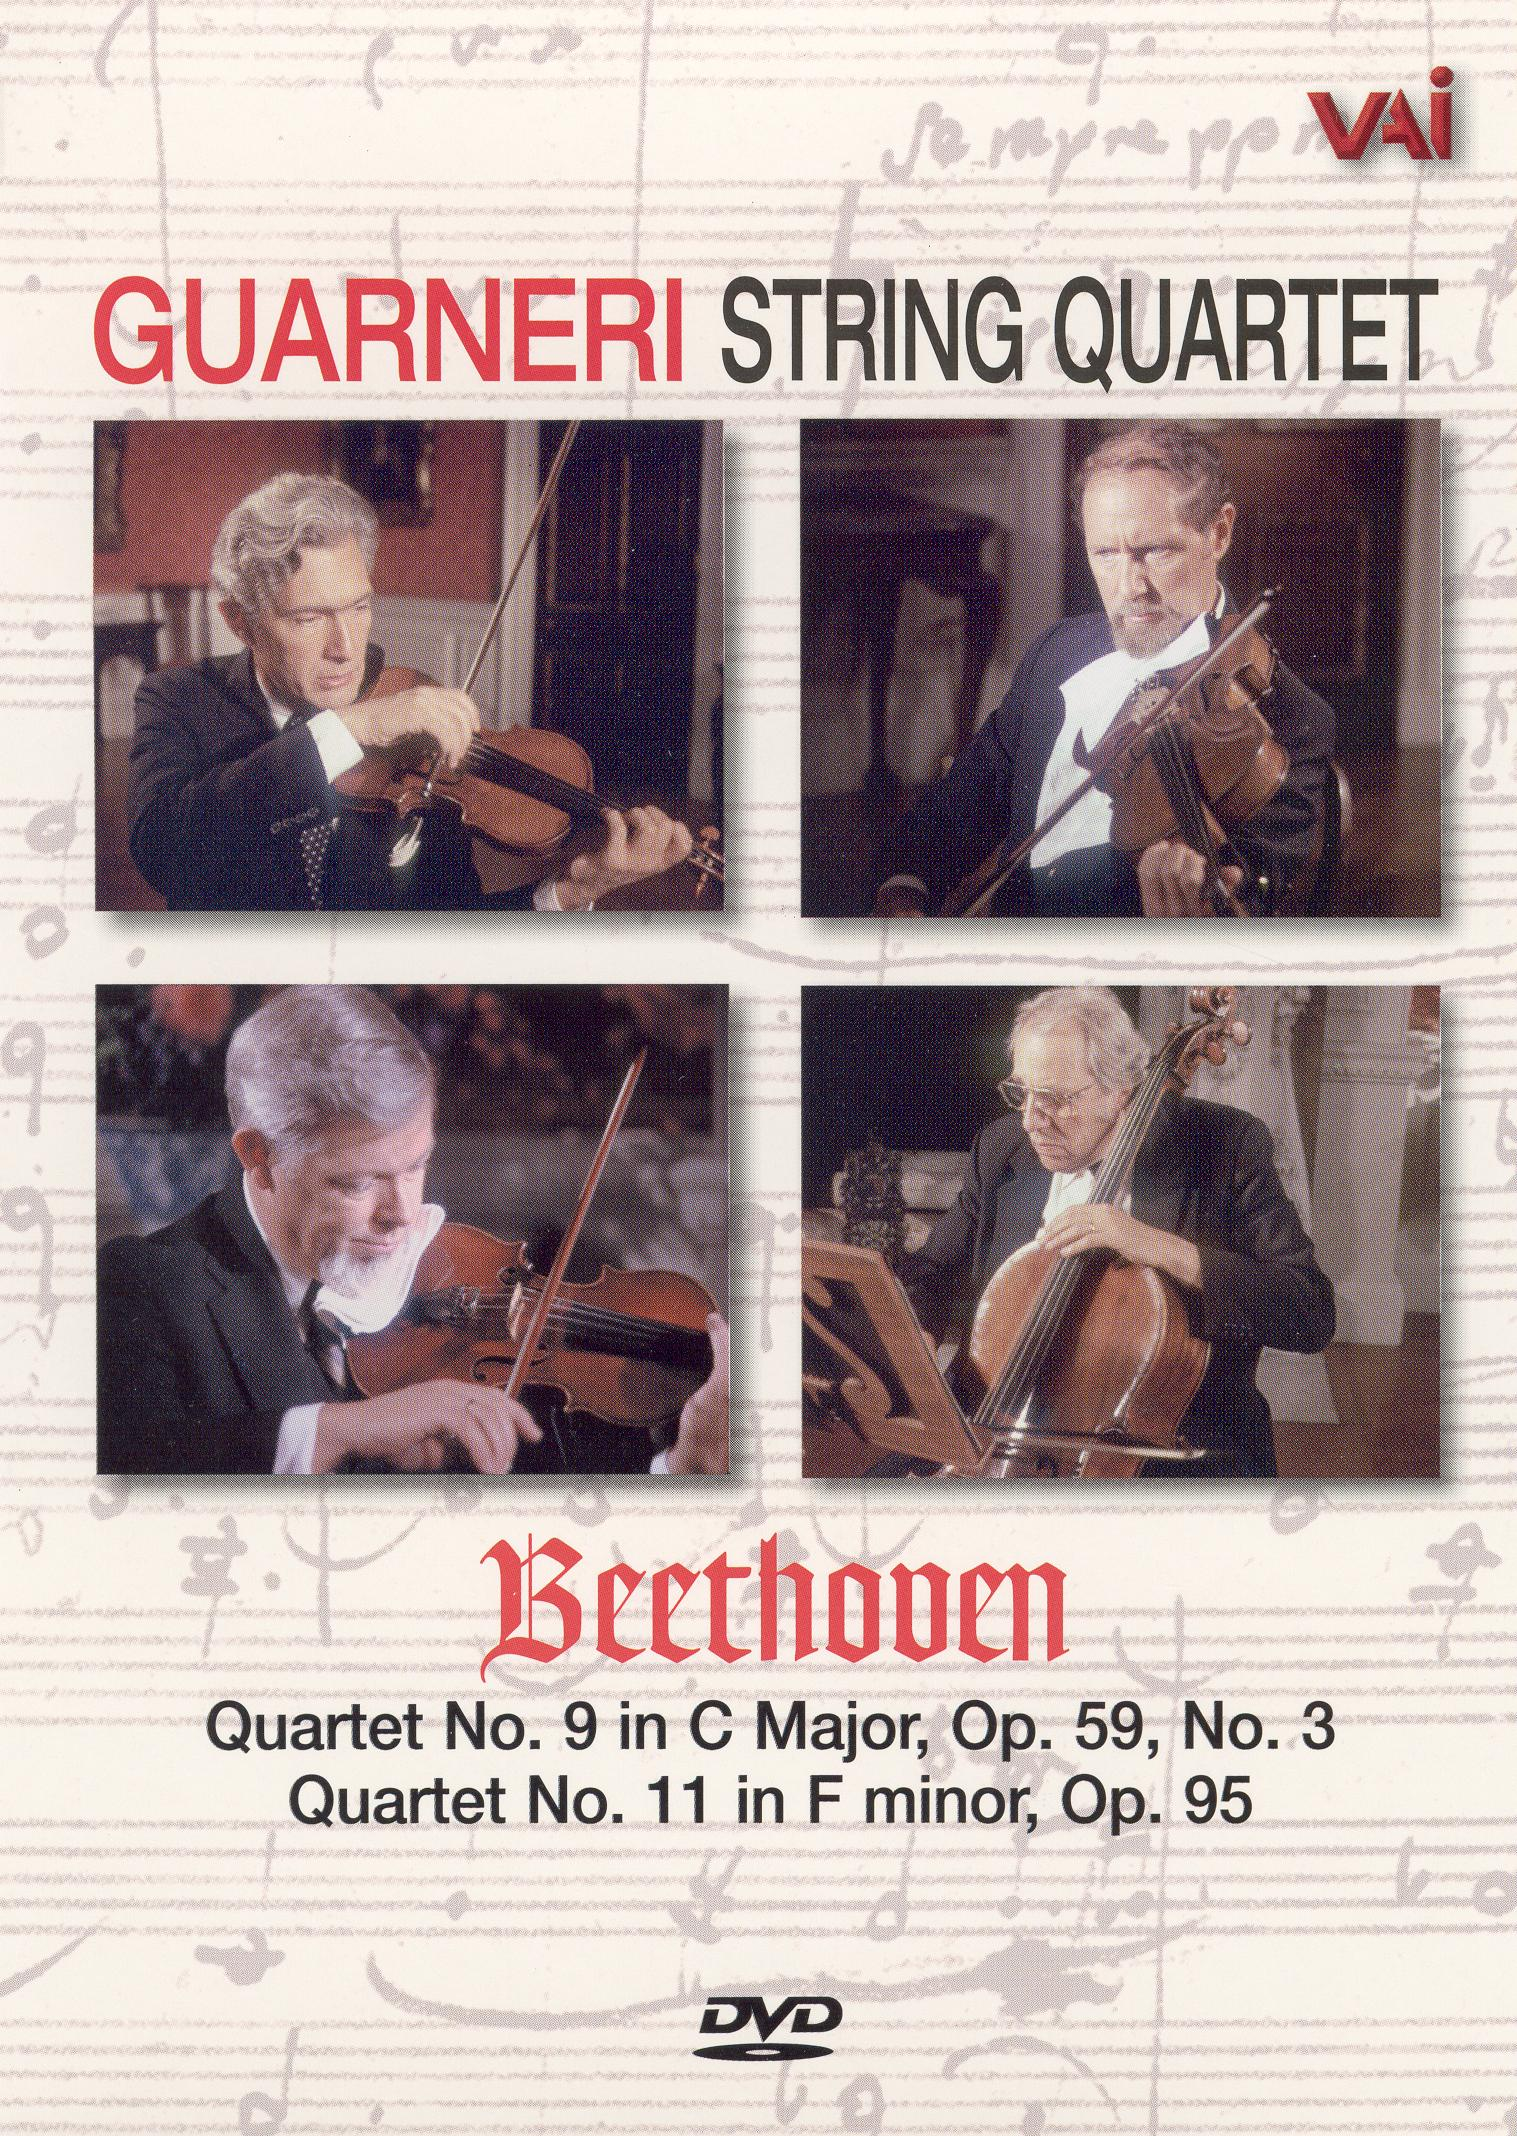 Guarneri String Quartet: The Beethoven Cycle